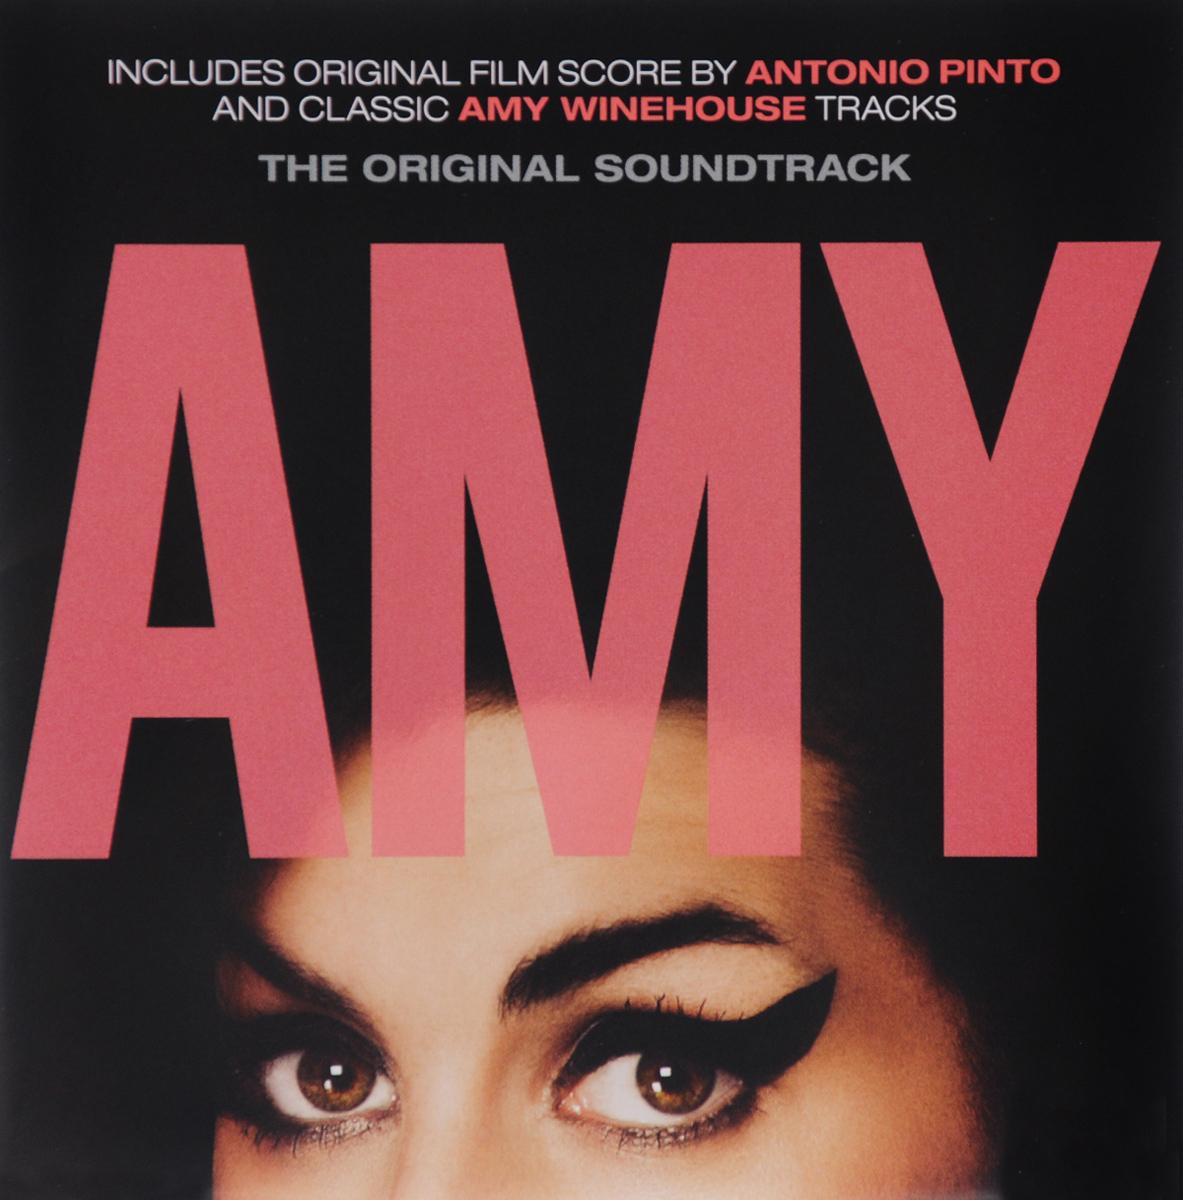 Amy. The Original Soundtrack дел шеннон билл хейли the crests фрэнки лимон the teenagers buster brown the continental kids flash cadillac original soundtrack american graffiti 2 cd